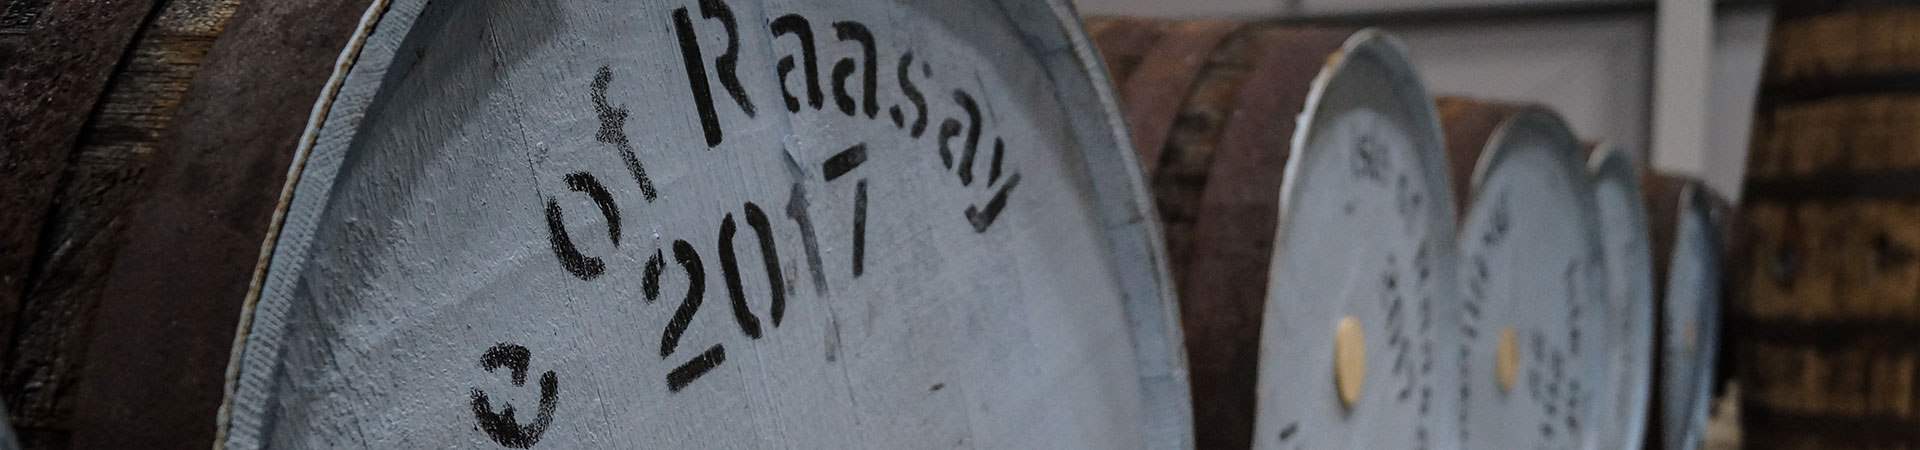 Raasay Distillery Members' Accommodation